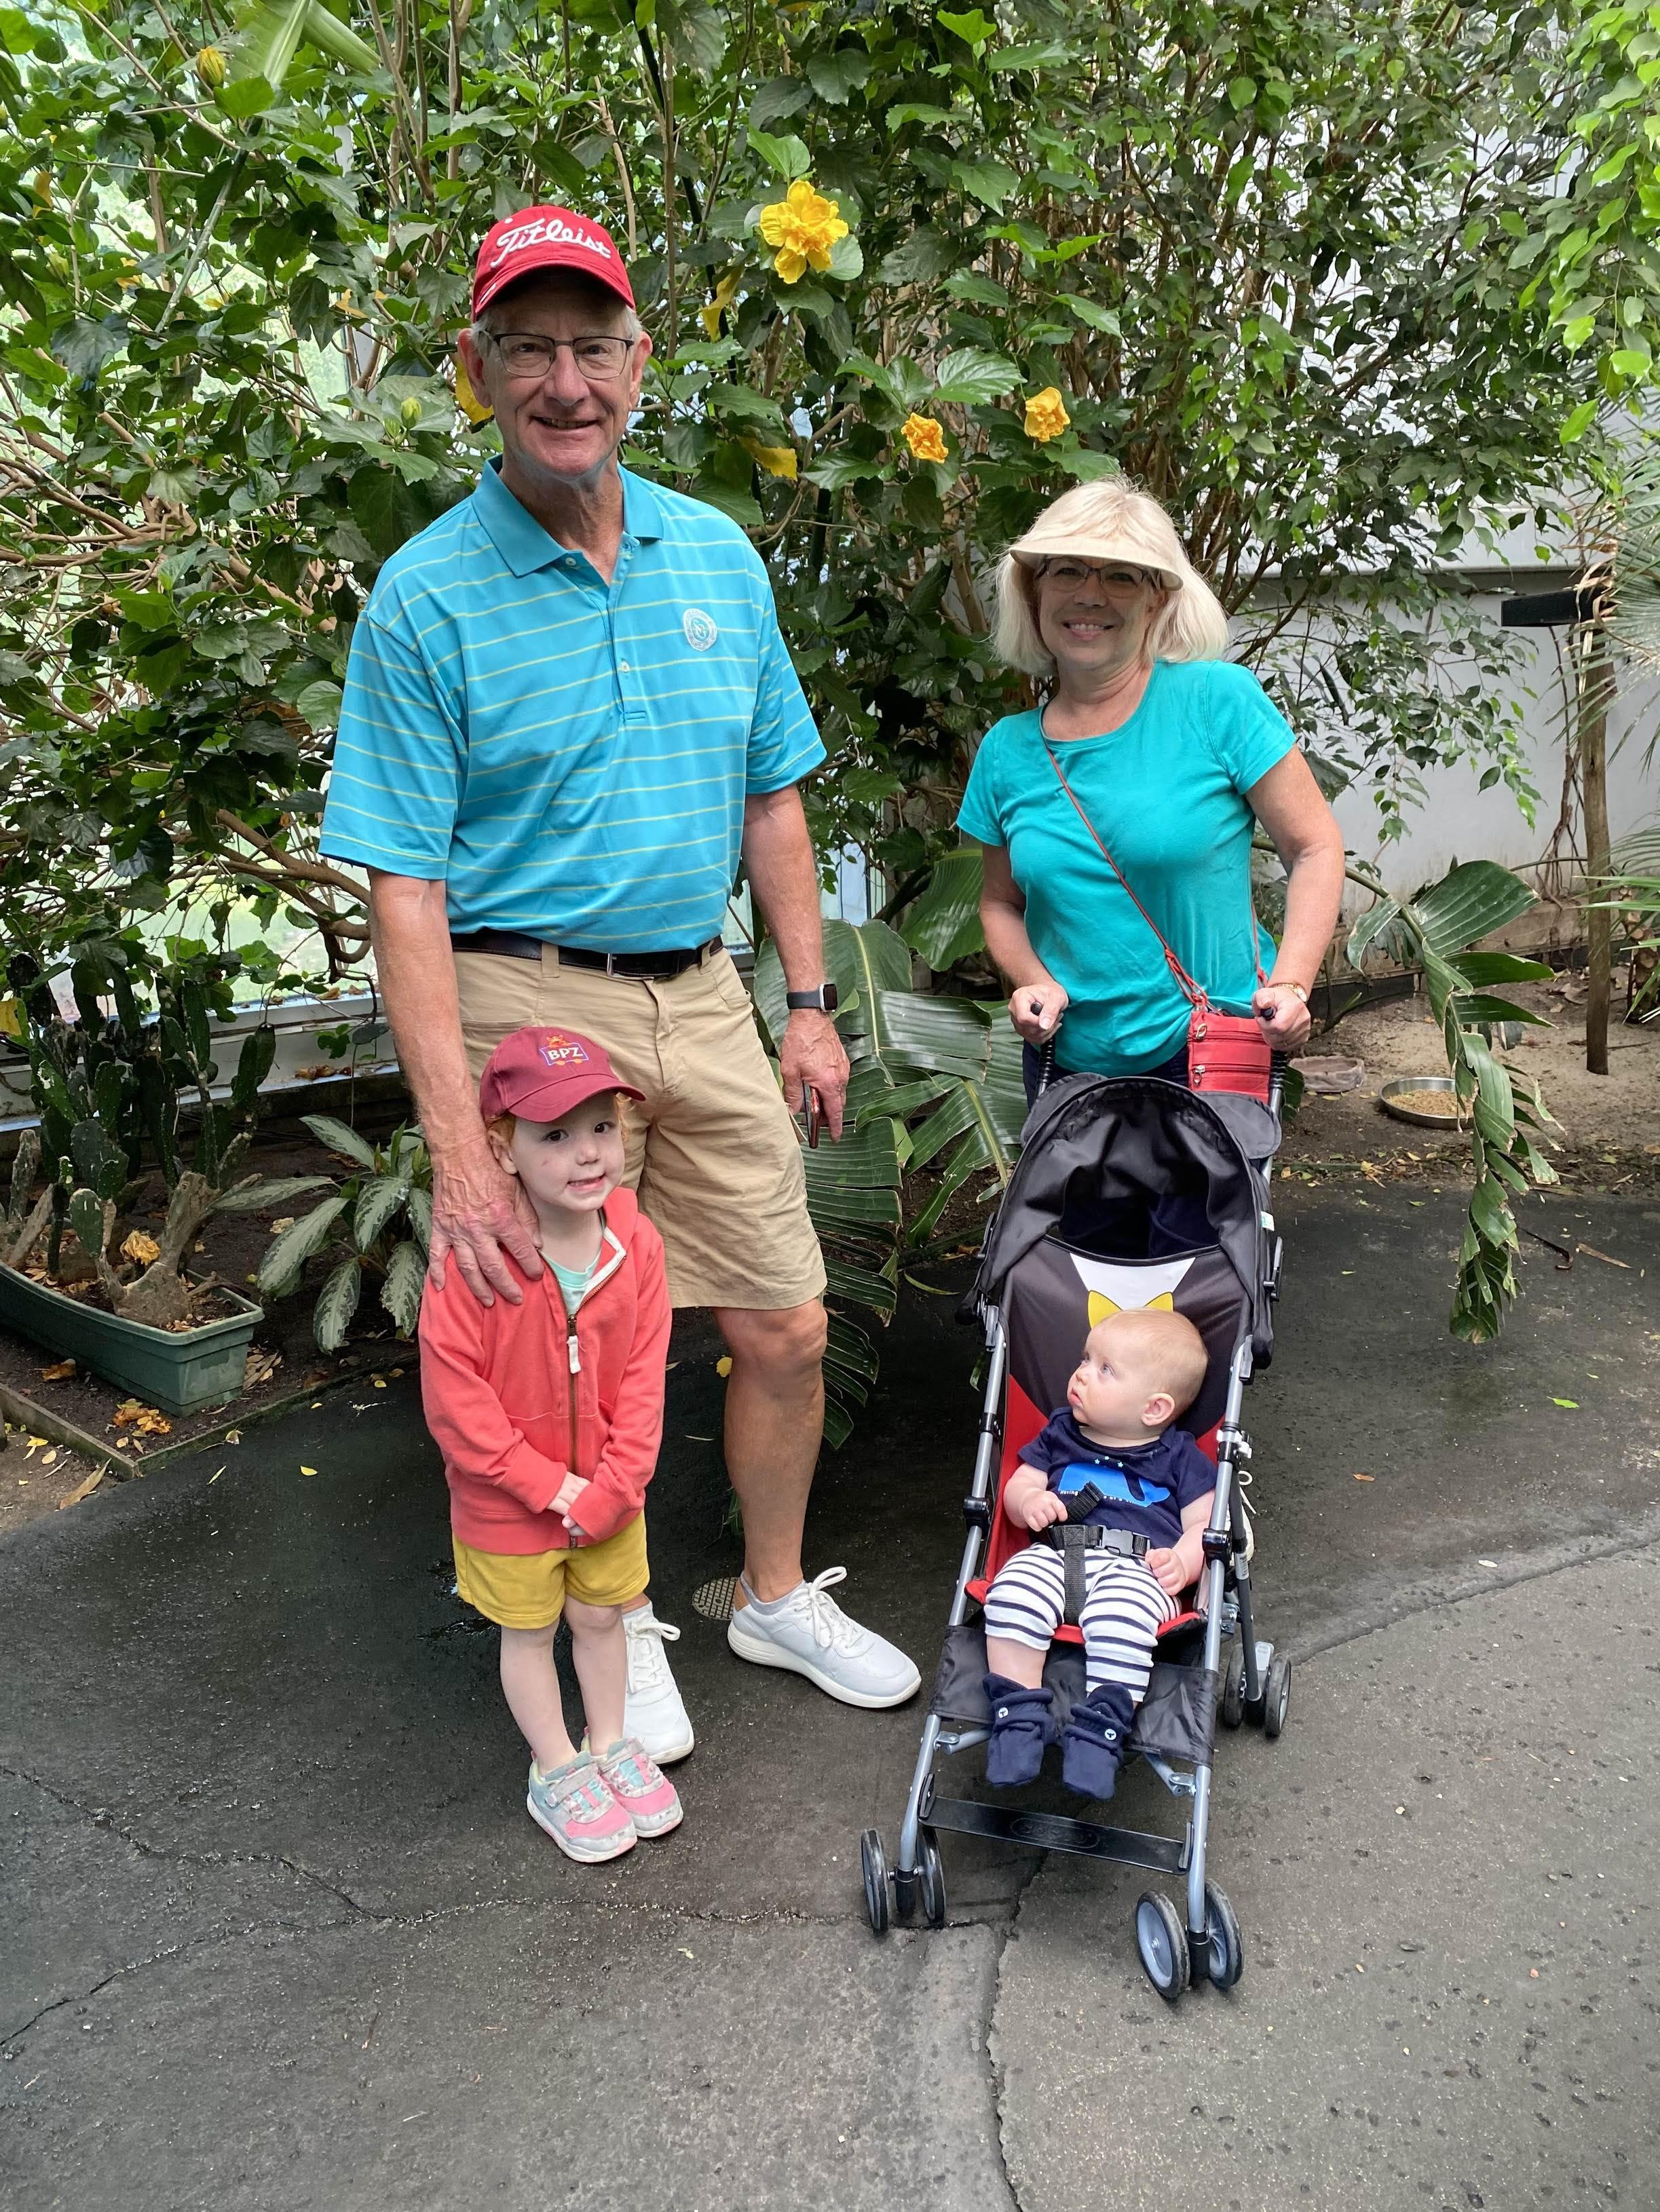 Blank Park Zoo in DSM USA